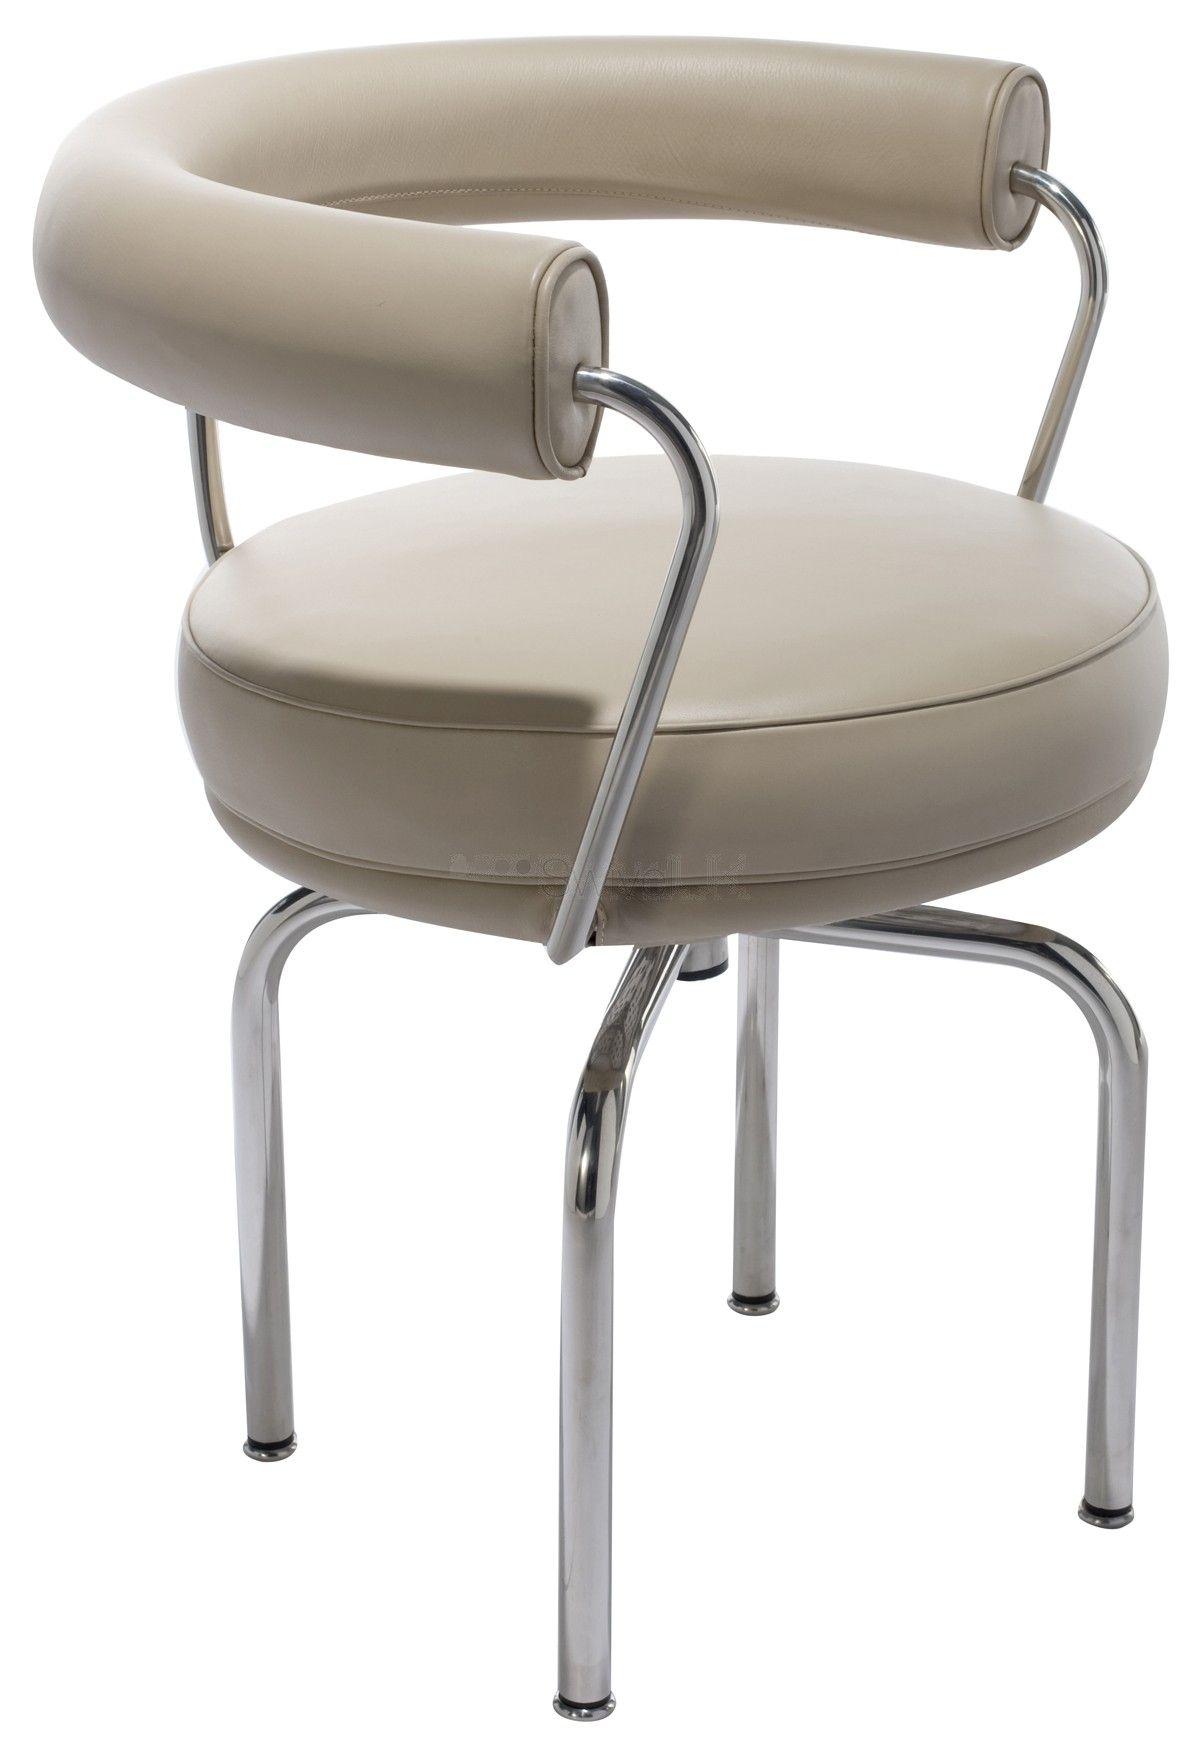 Chaise pivotante Le Corbusier LC7 - 1929. Le Corbusier dessina cette ...